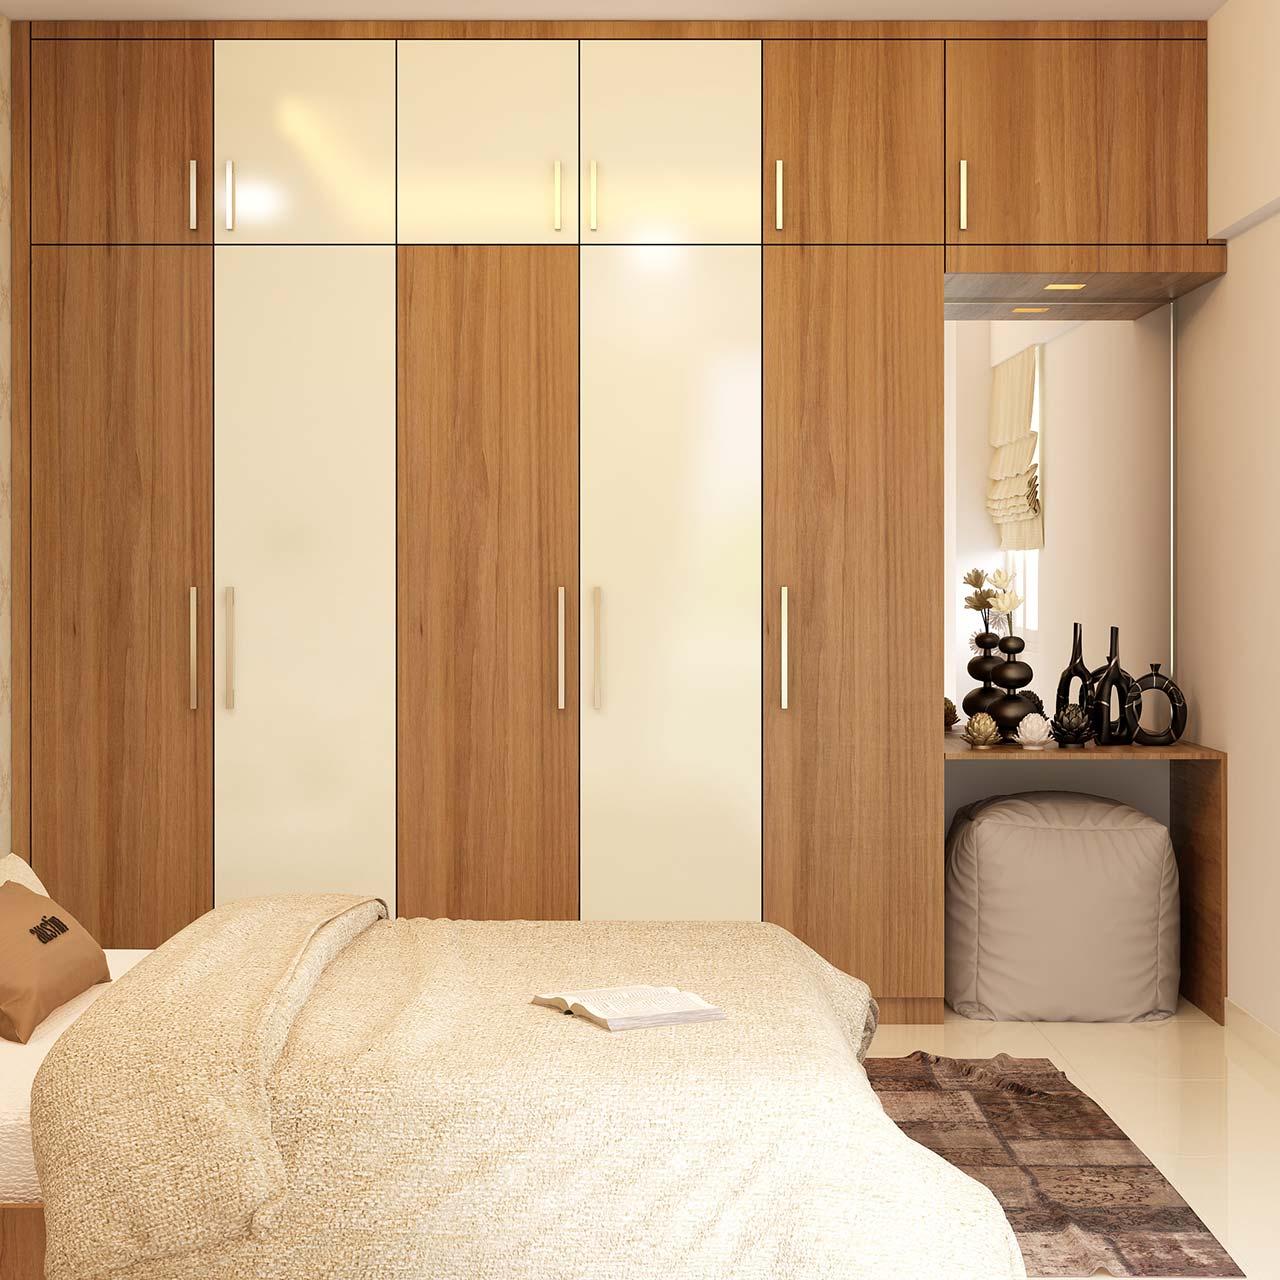 How to do interior design your bedroom, check bedroom interior checklist